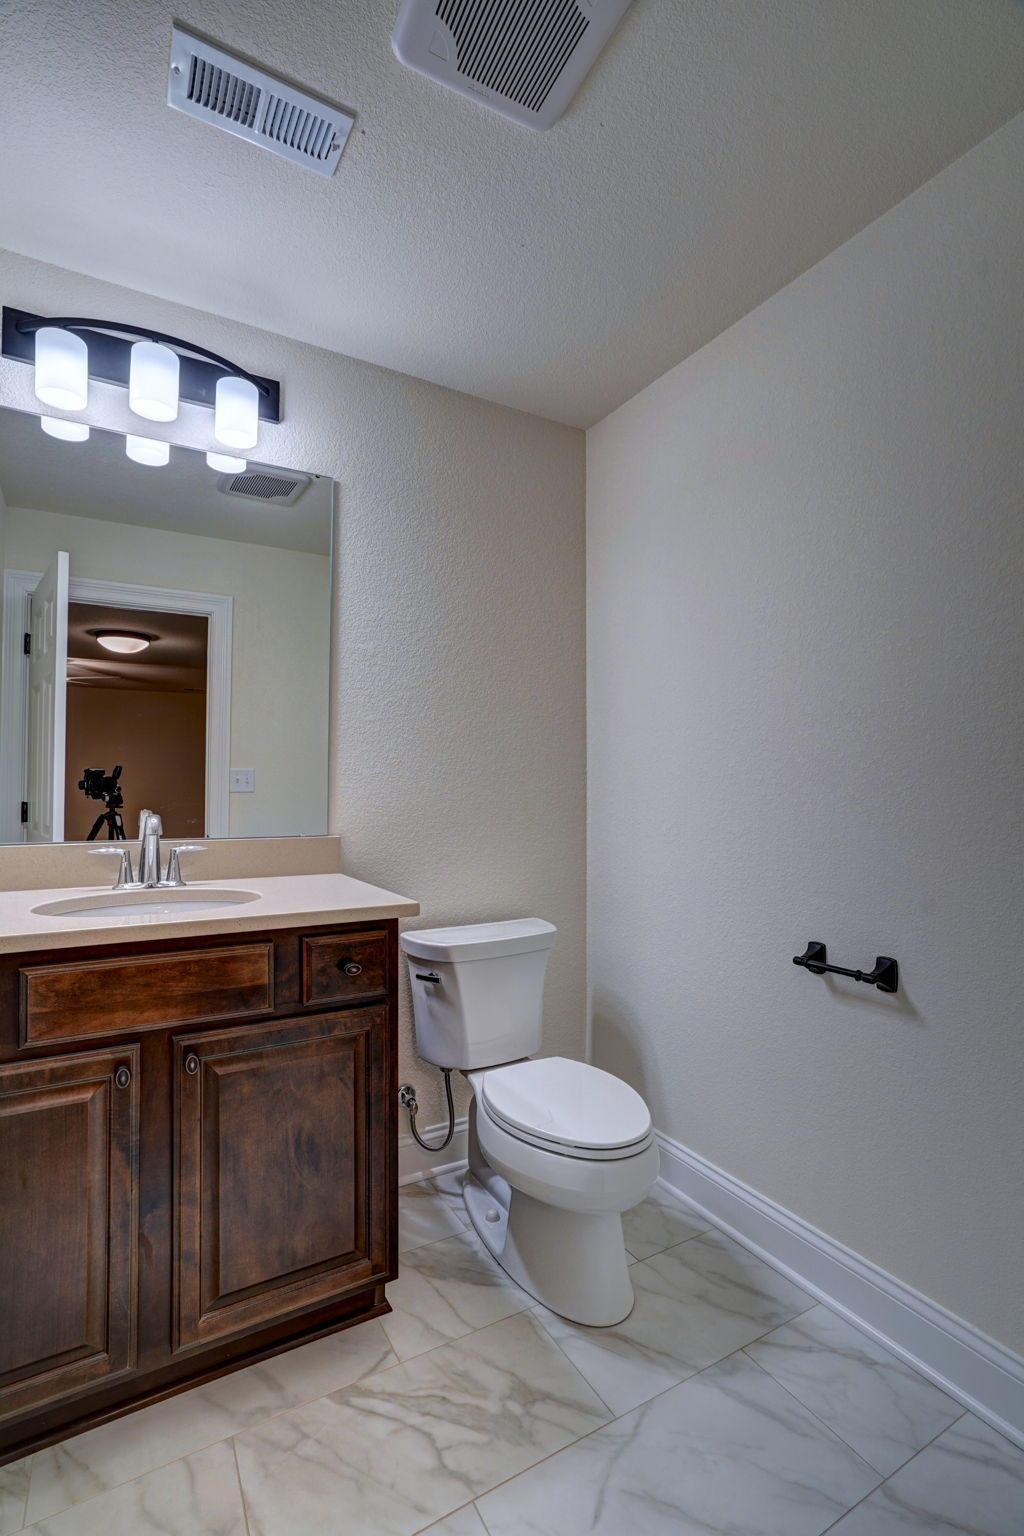 2000 Norfolk Ct, Union Grove, Wisconsin 53182, 3 Bedrooms Bedrooms, 7 Rooms Rooms,2 BathroomsBathrooms,Single-family,For Sale,Norfolk Ct,1721777